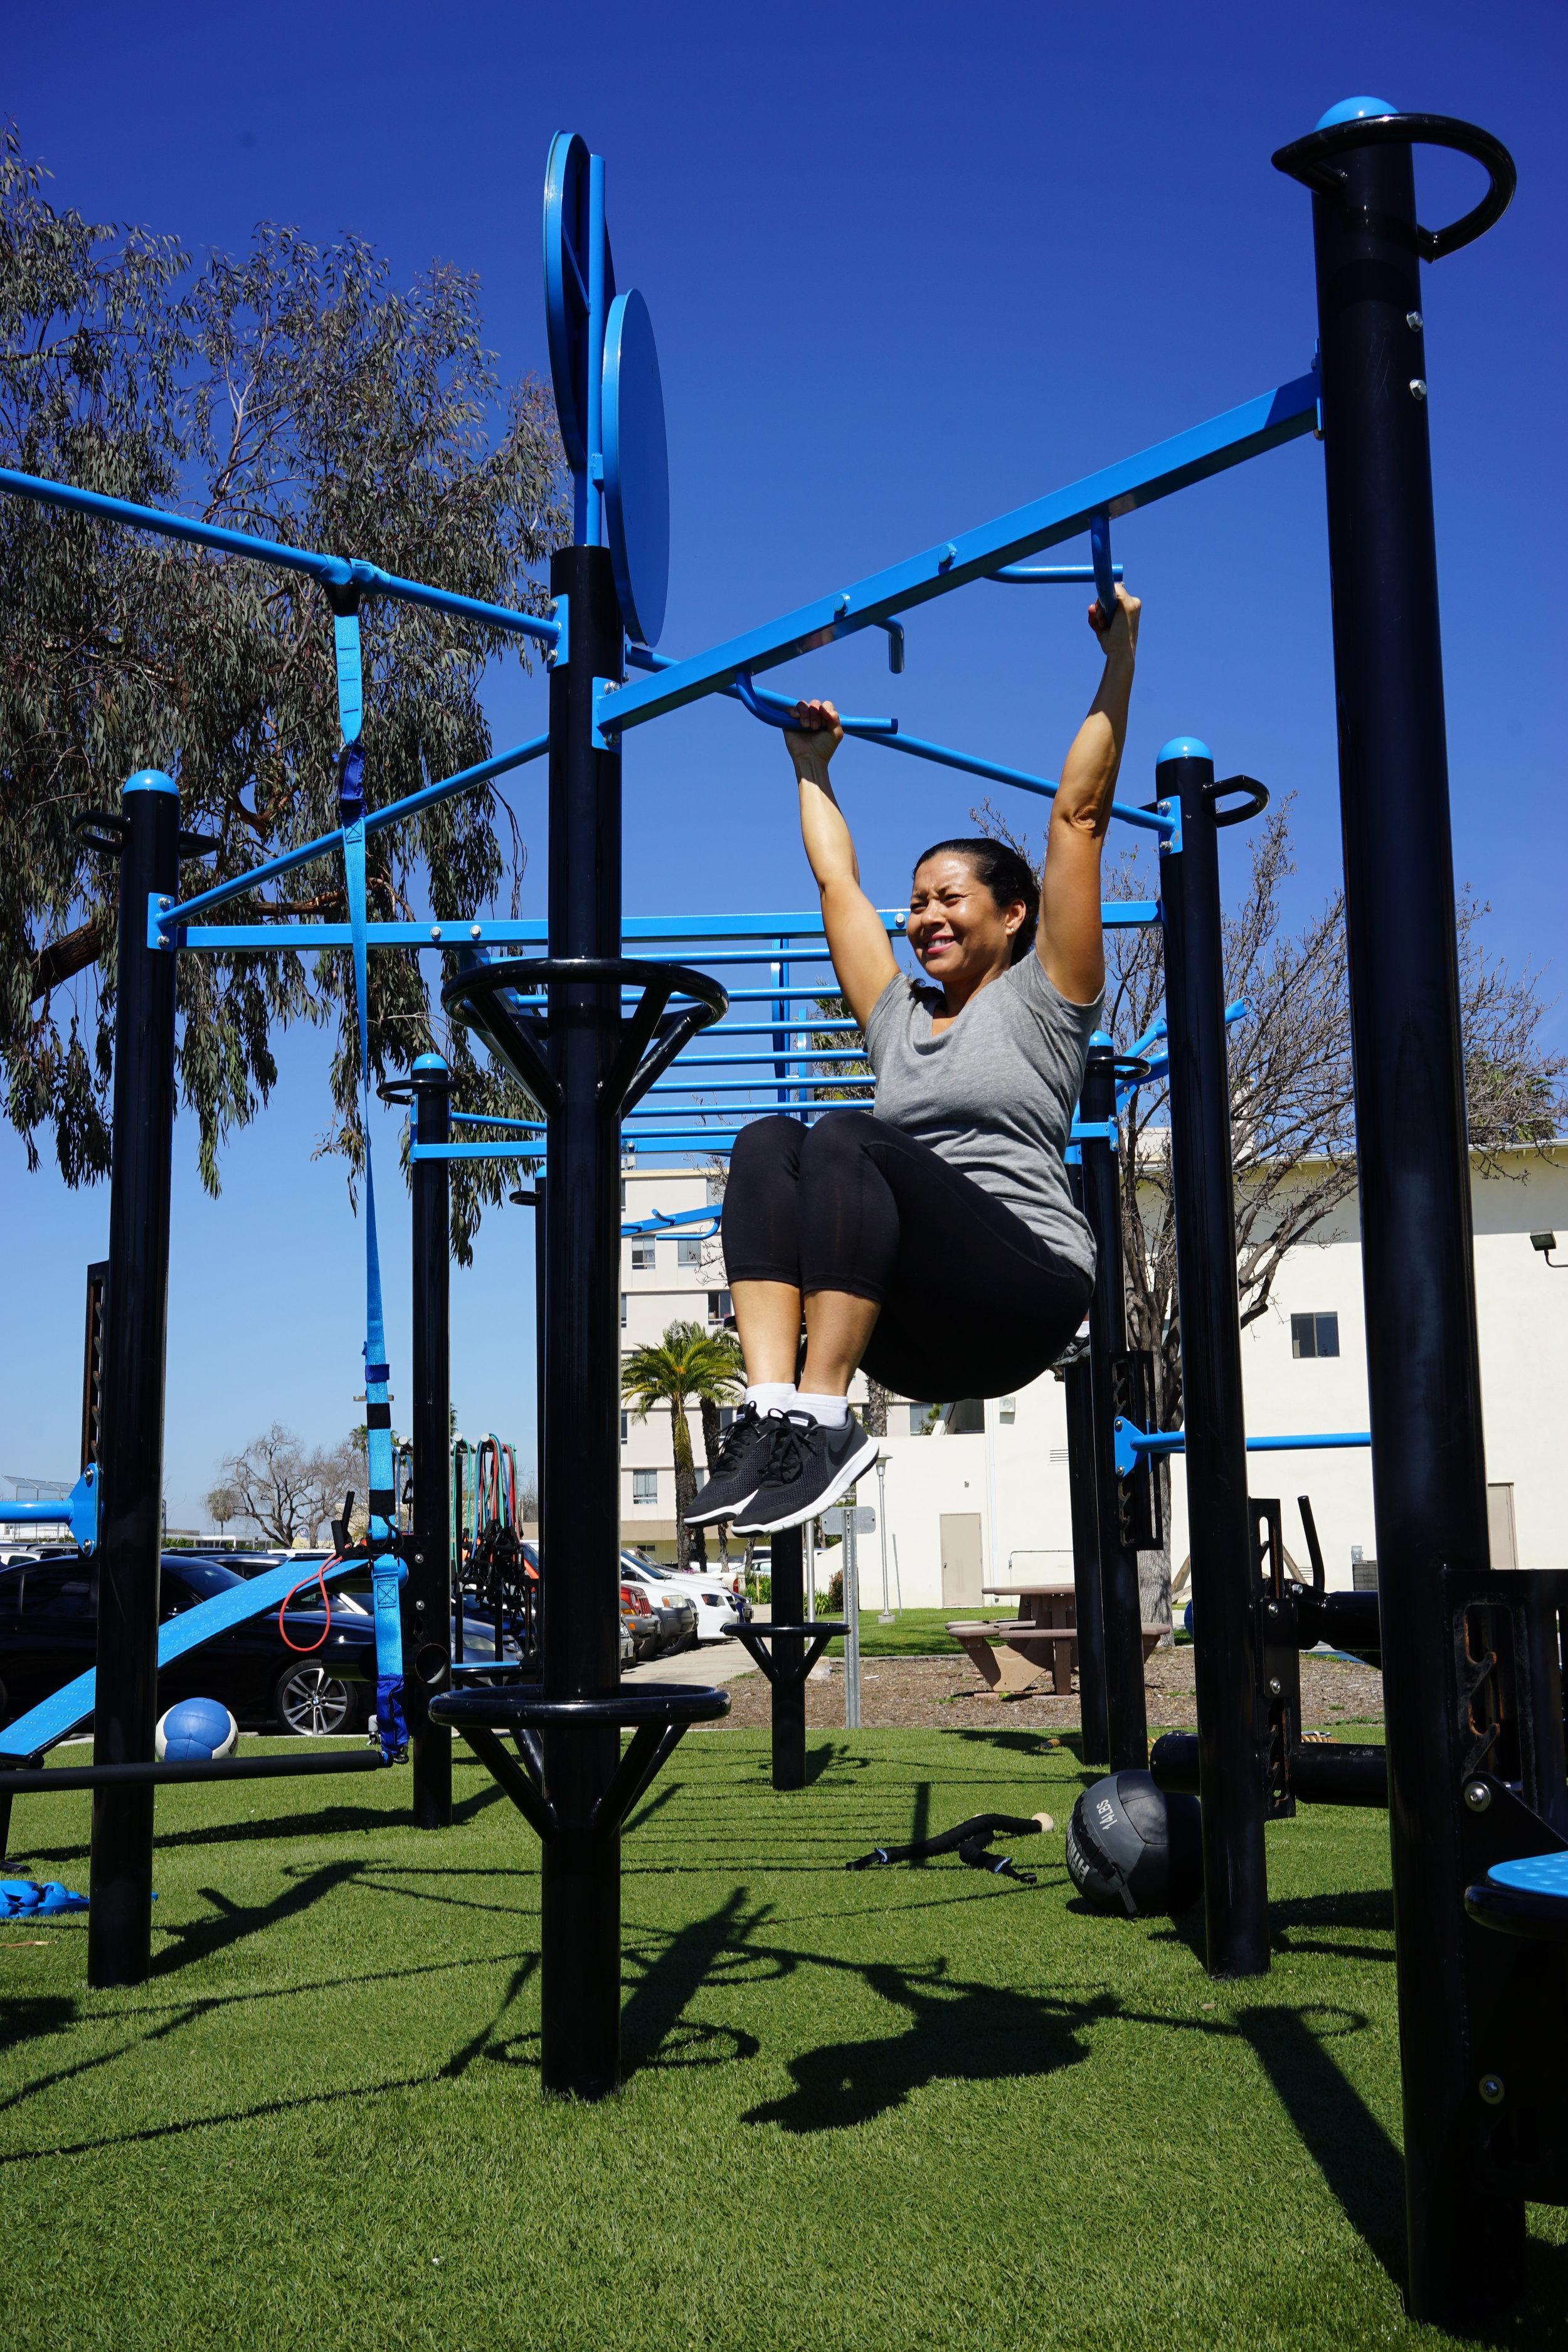 Knee raise on pull-up bar